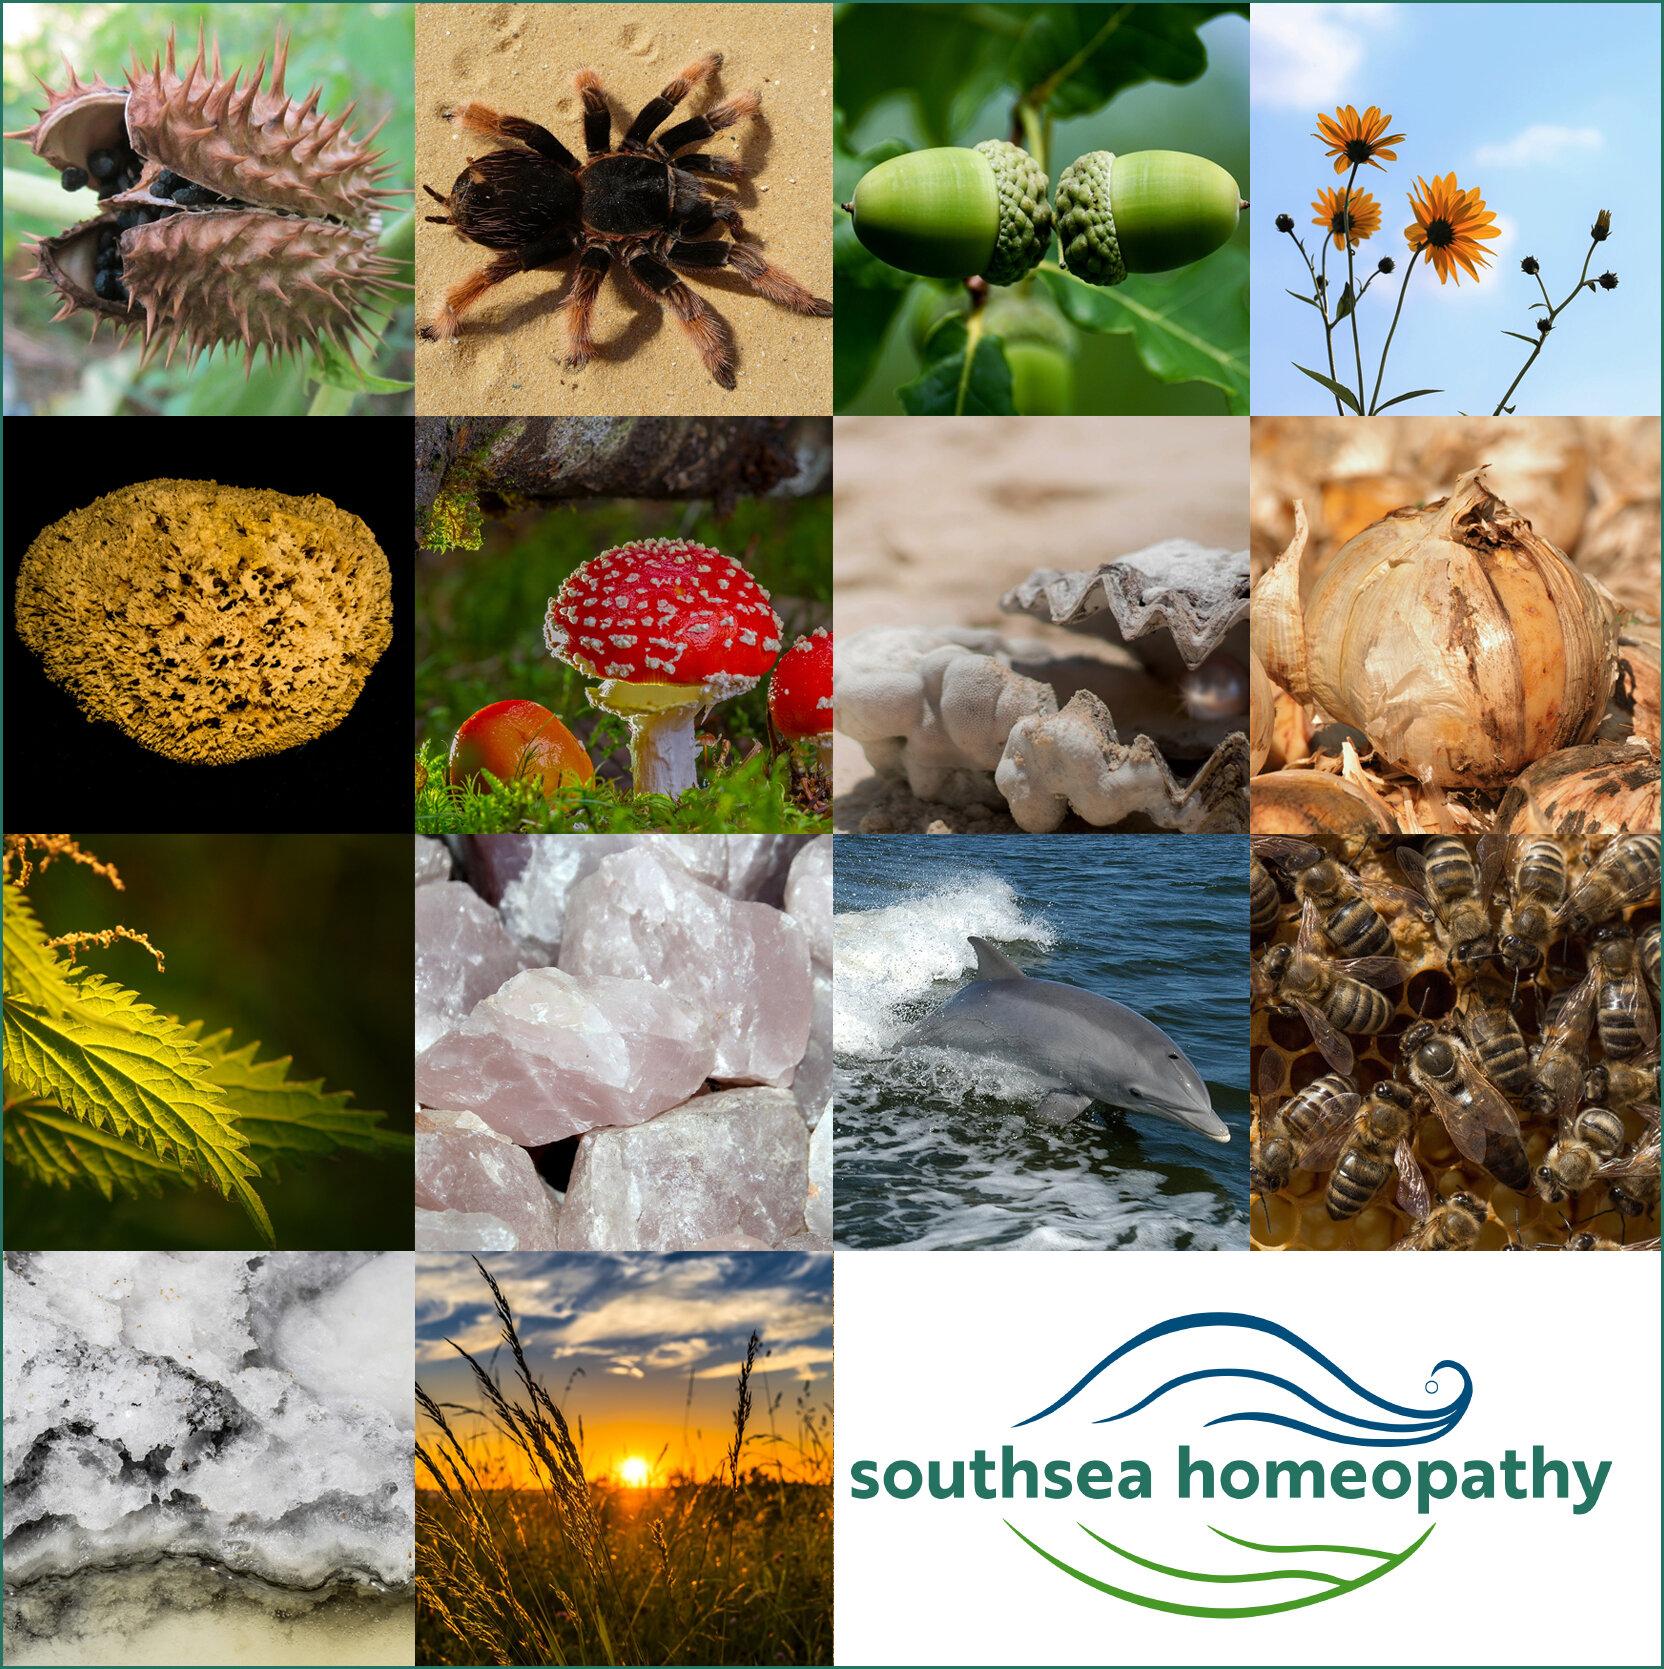 southseaHomeopathy_poster_varC_v001.jpg